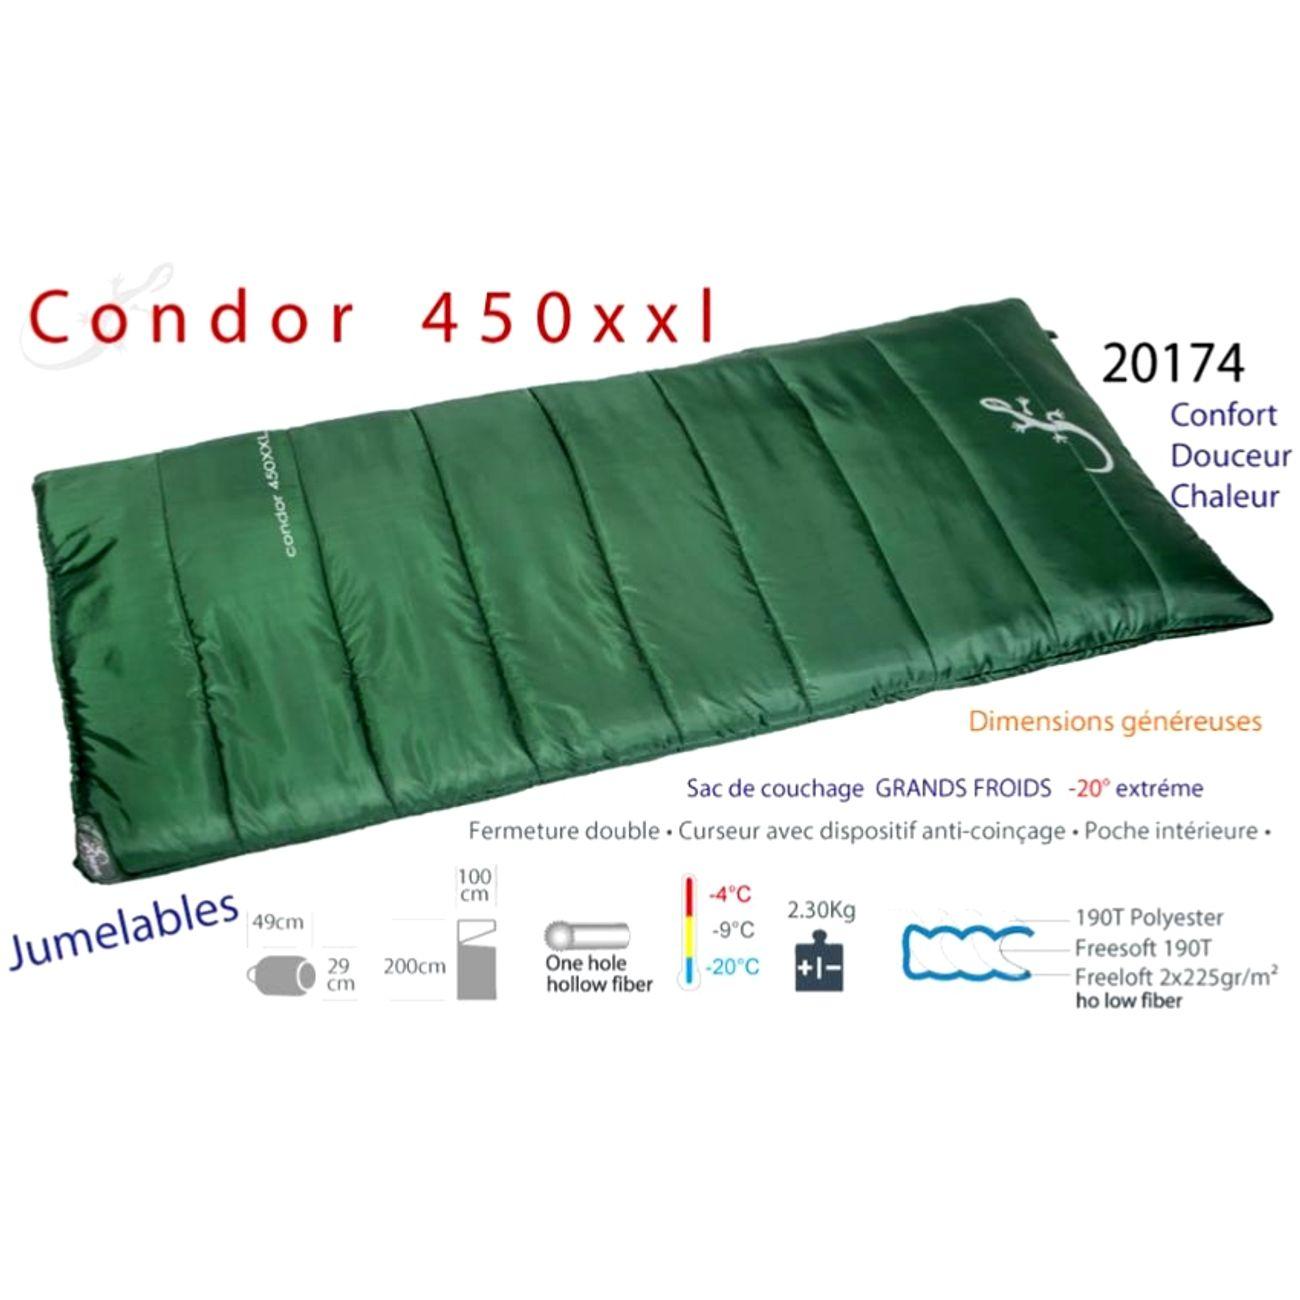 Camping  FREETIME Condor 450xxl CONDOR 450xxl -Sac de couchage grand froid -20°C - grand sac de couchage couverture-Freetime